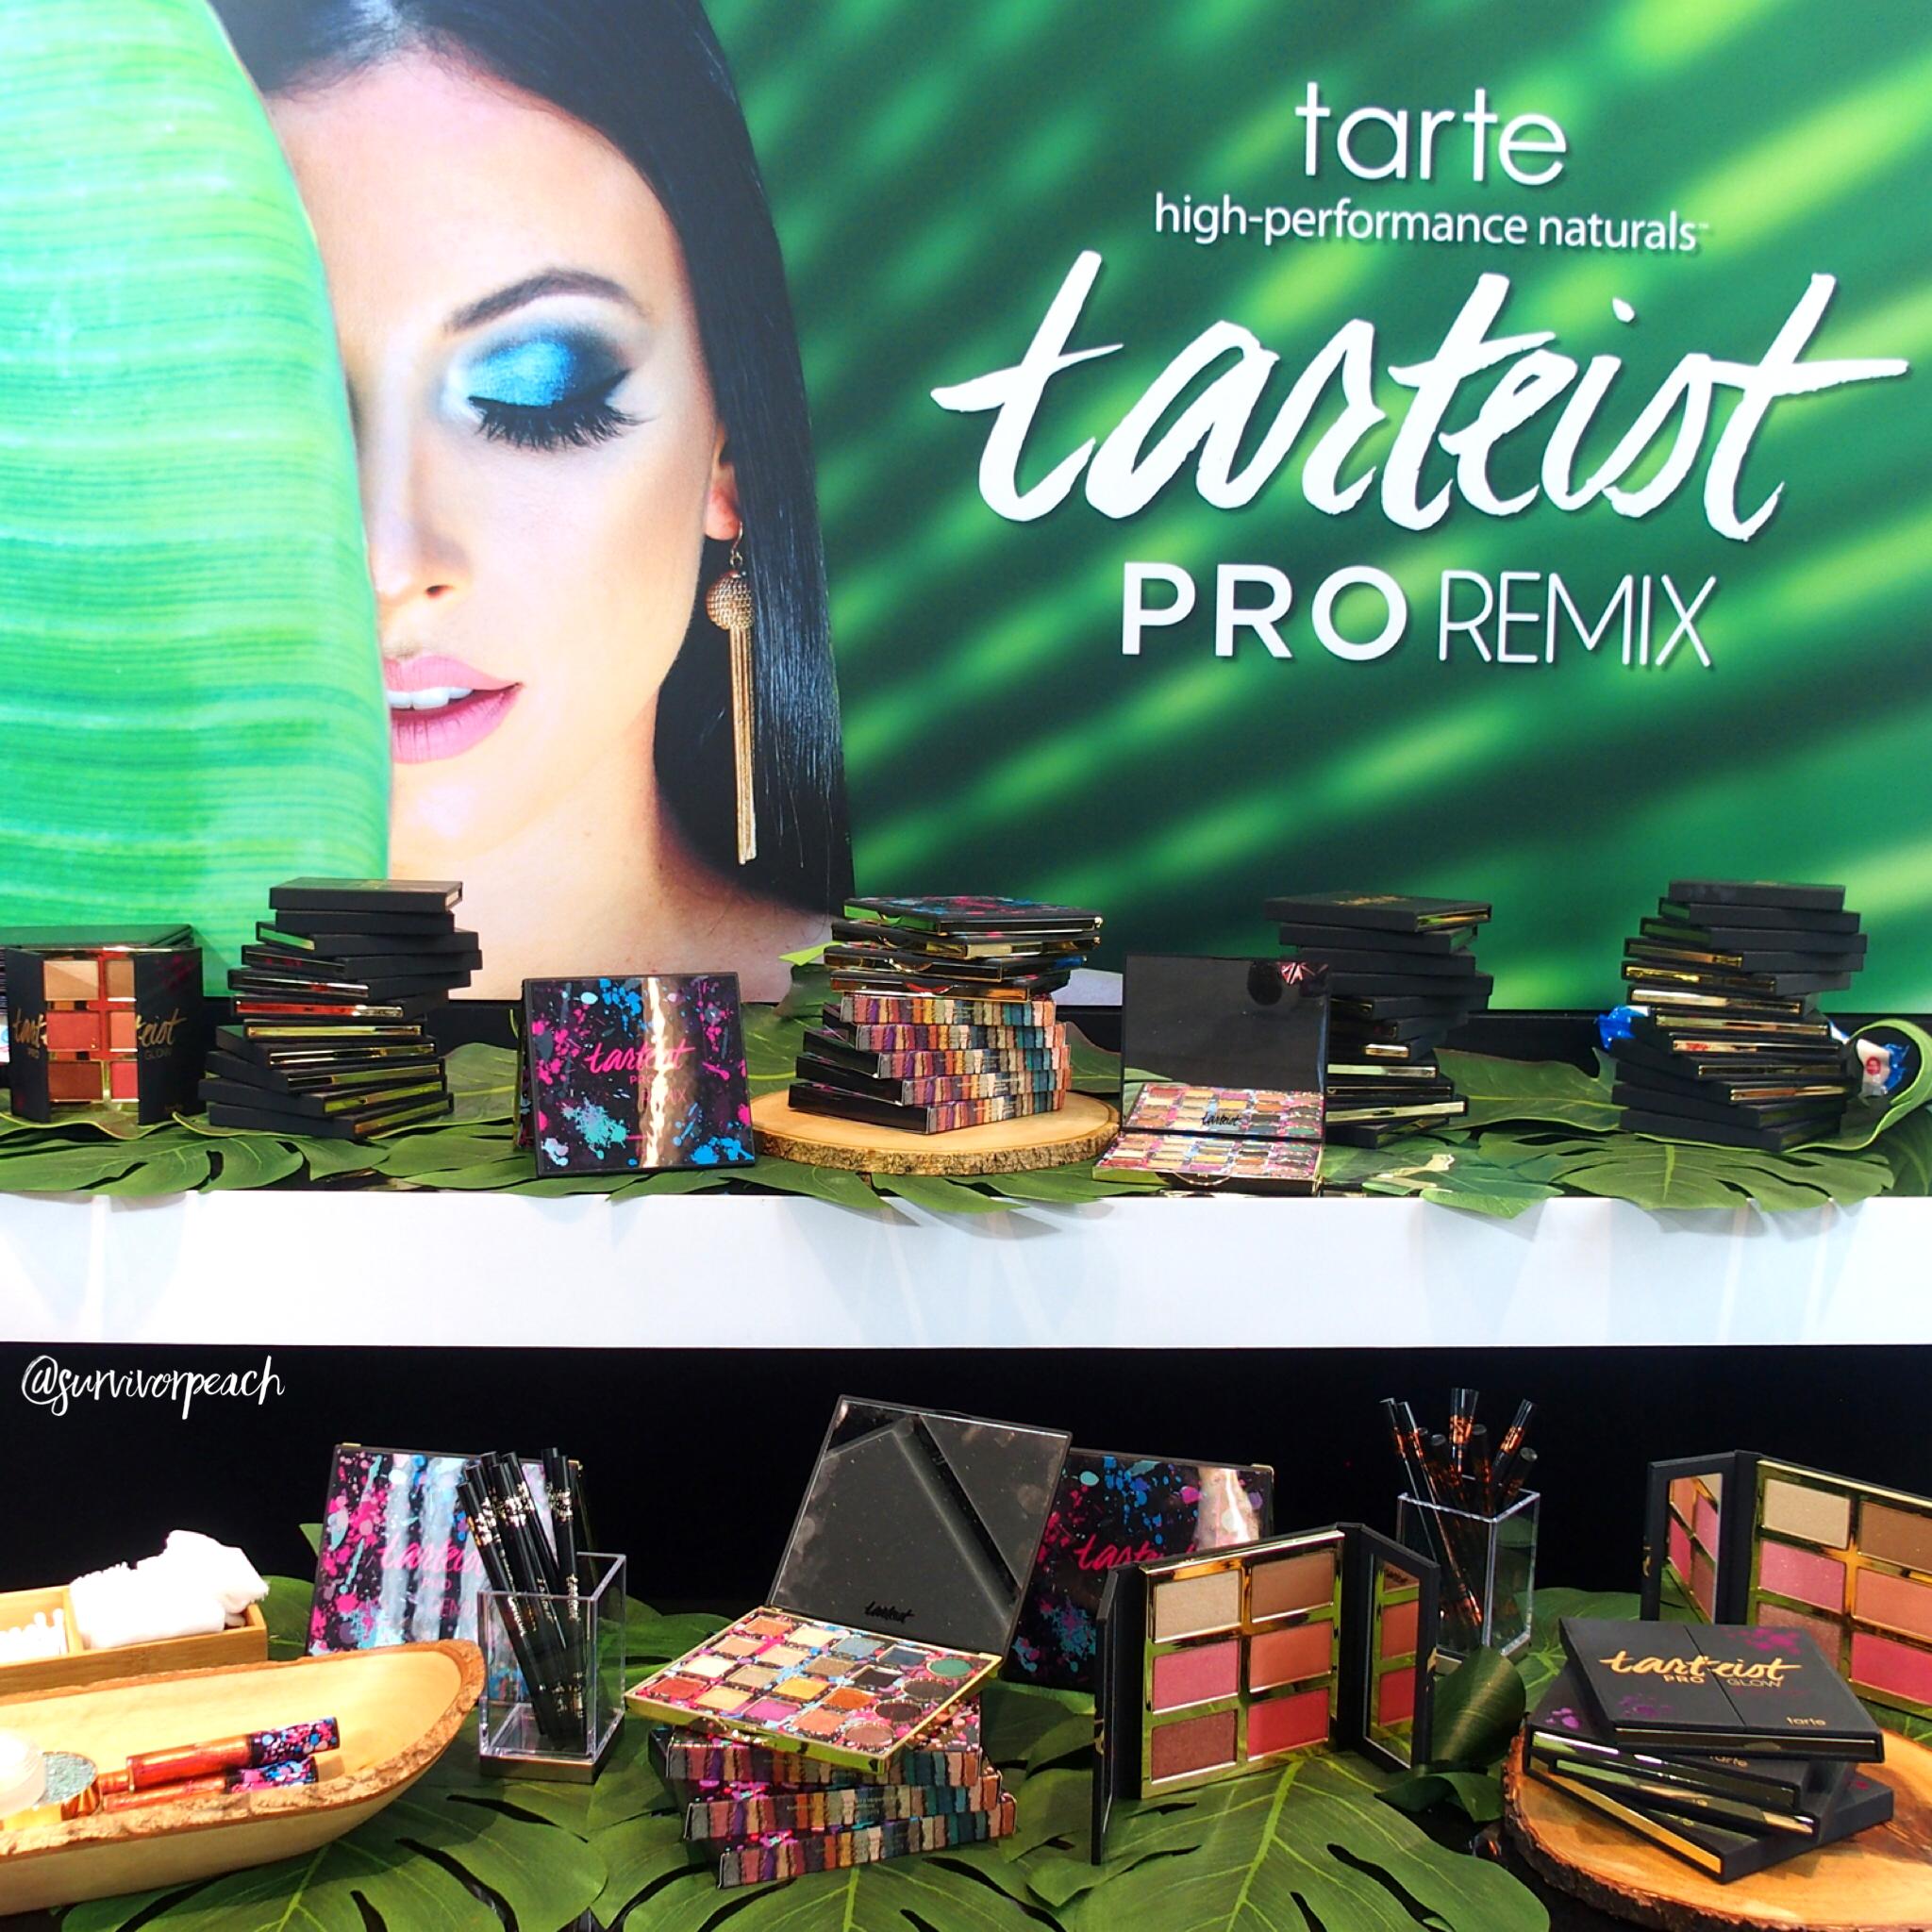 Tarte Pro remix